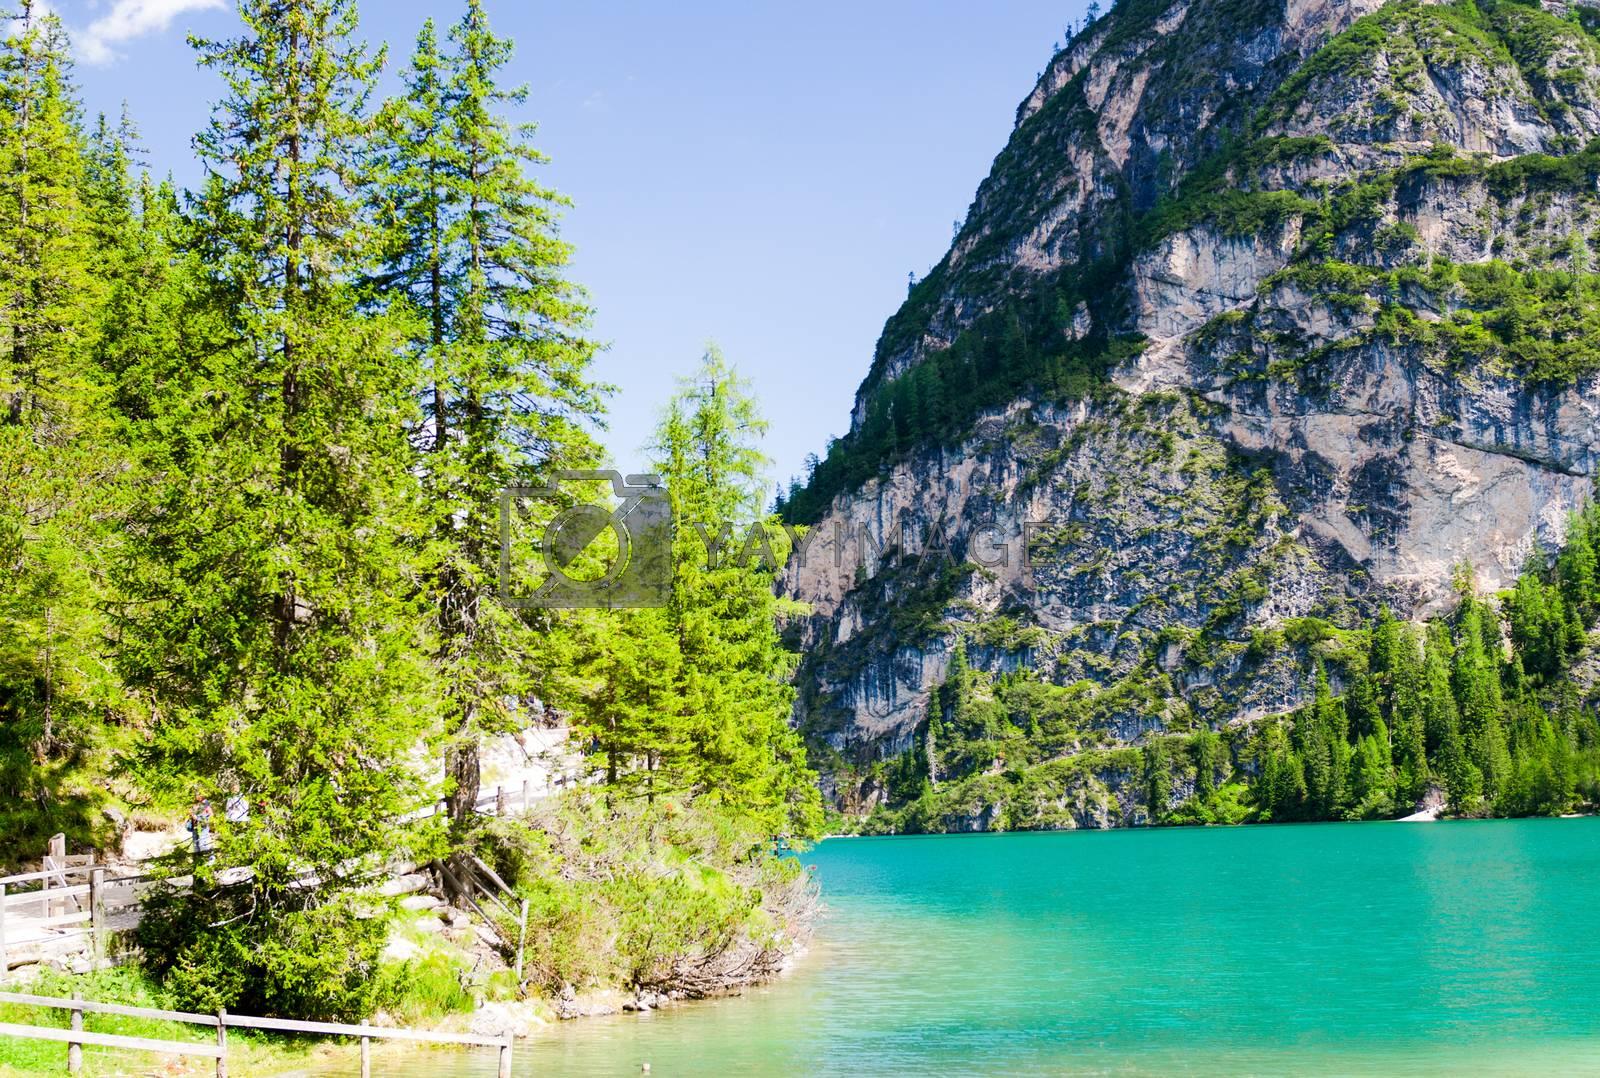 Wonderful waters of Braies lake on a summer day - Italian Alps.